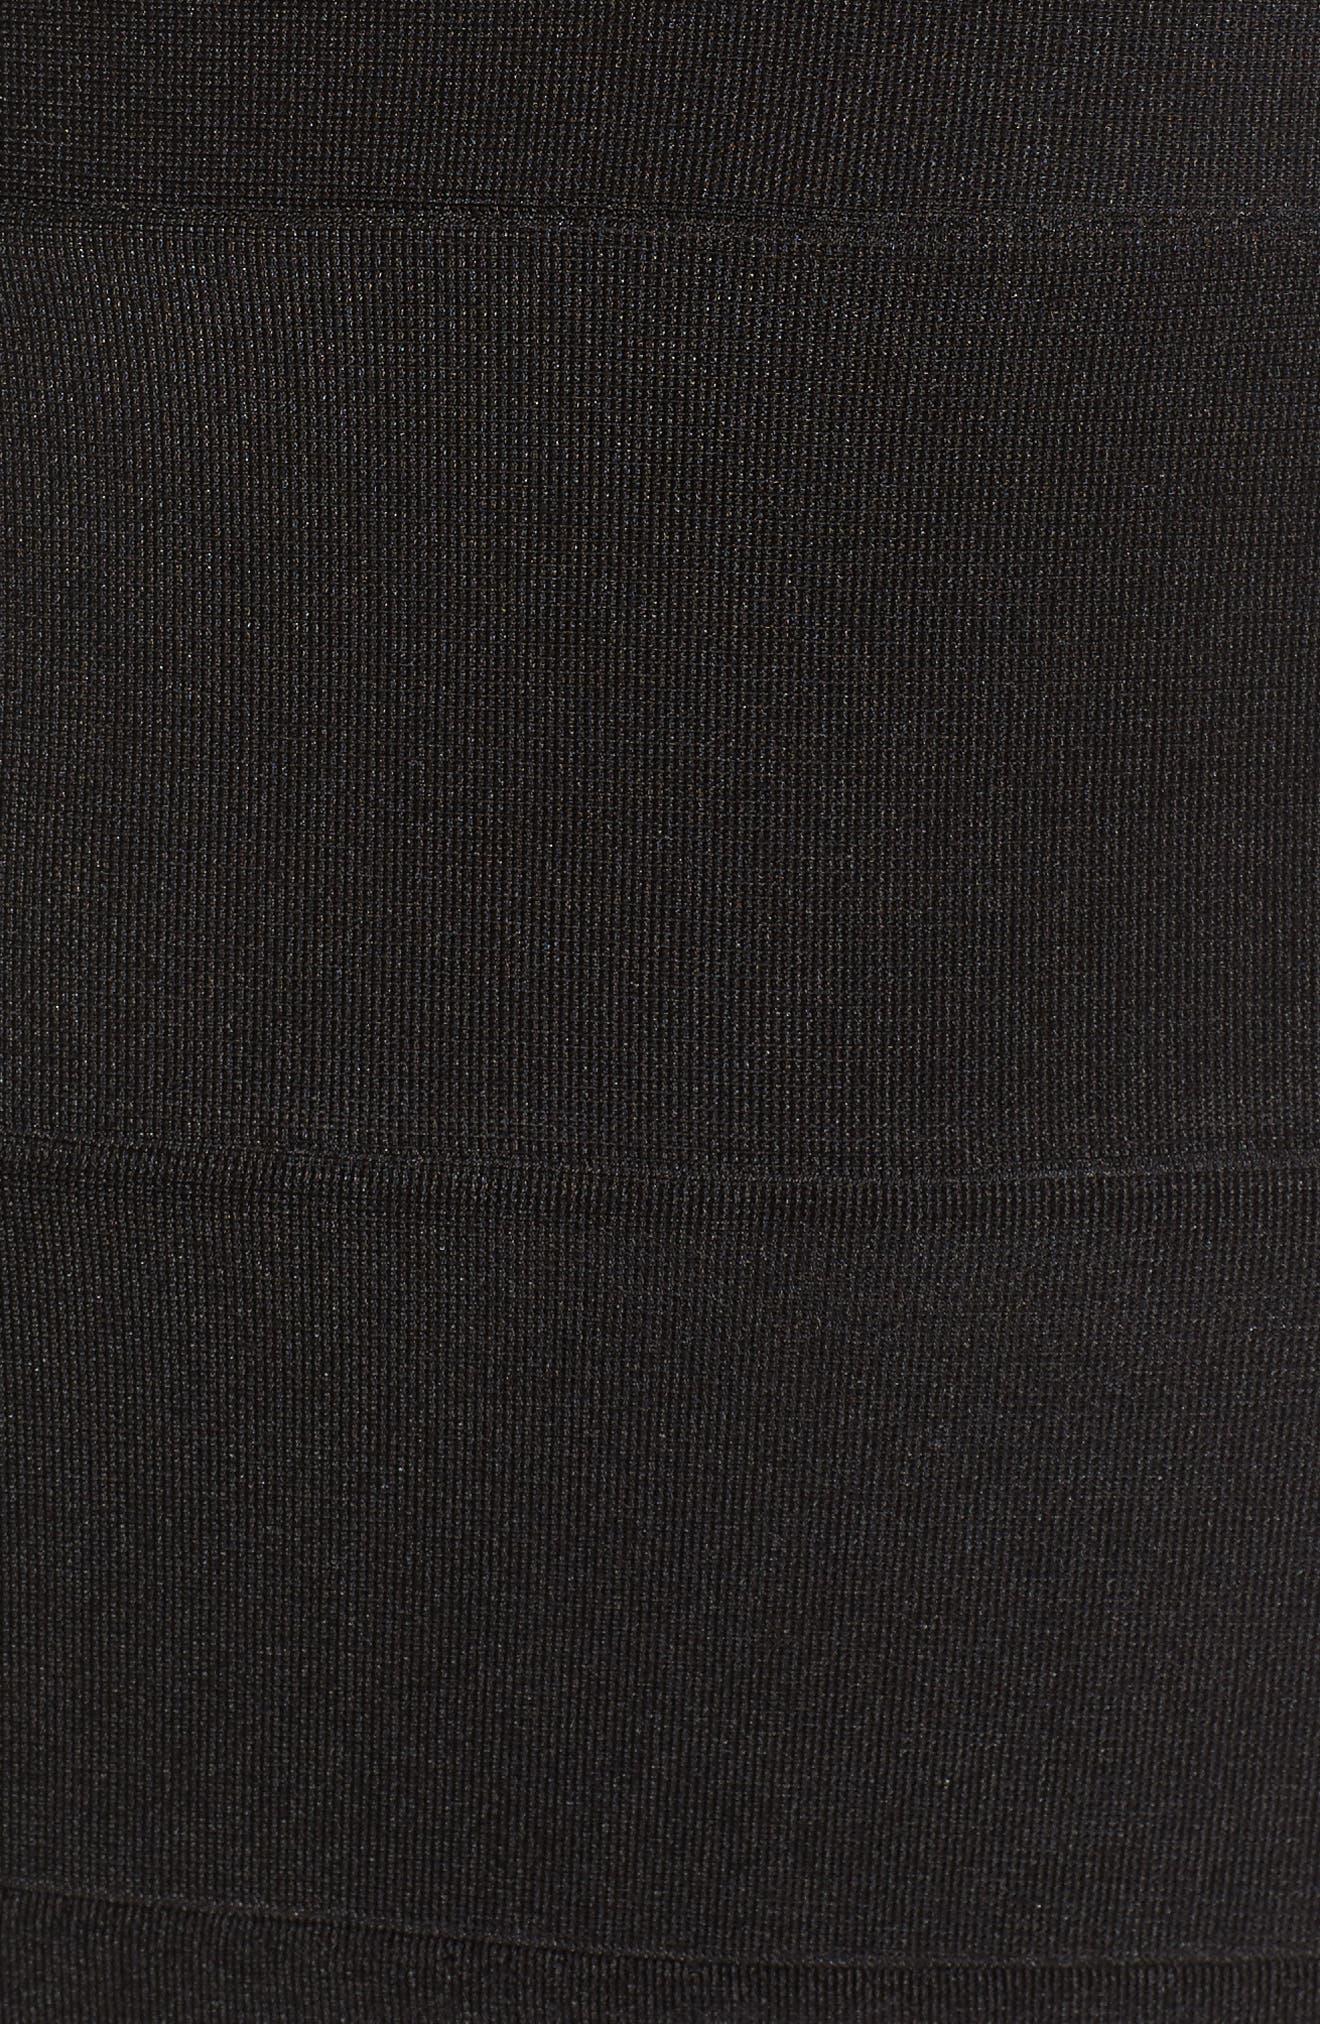 Lace Back Body-Con Dress,                             Alternate thumbnail 5, color,                             Black